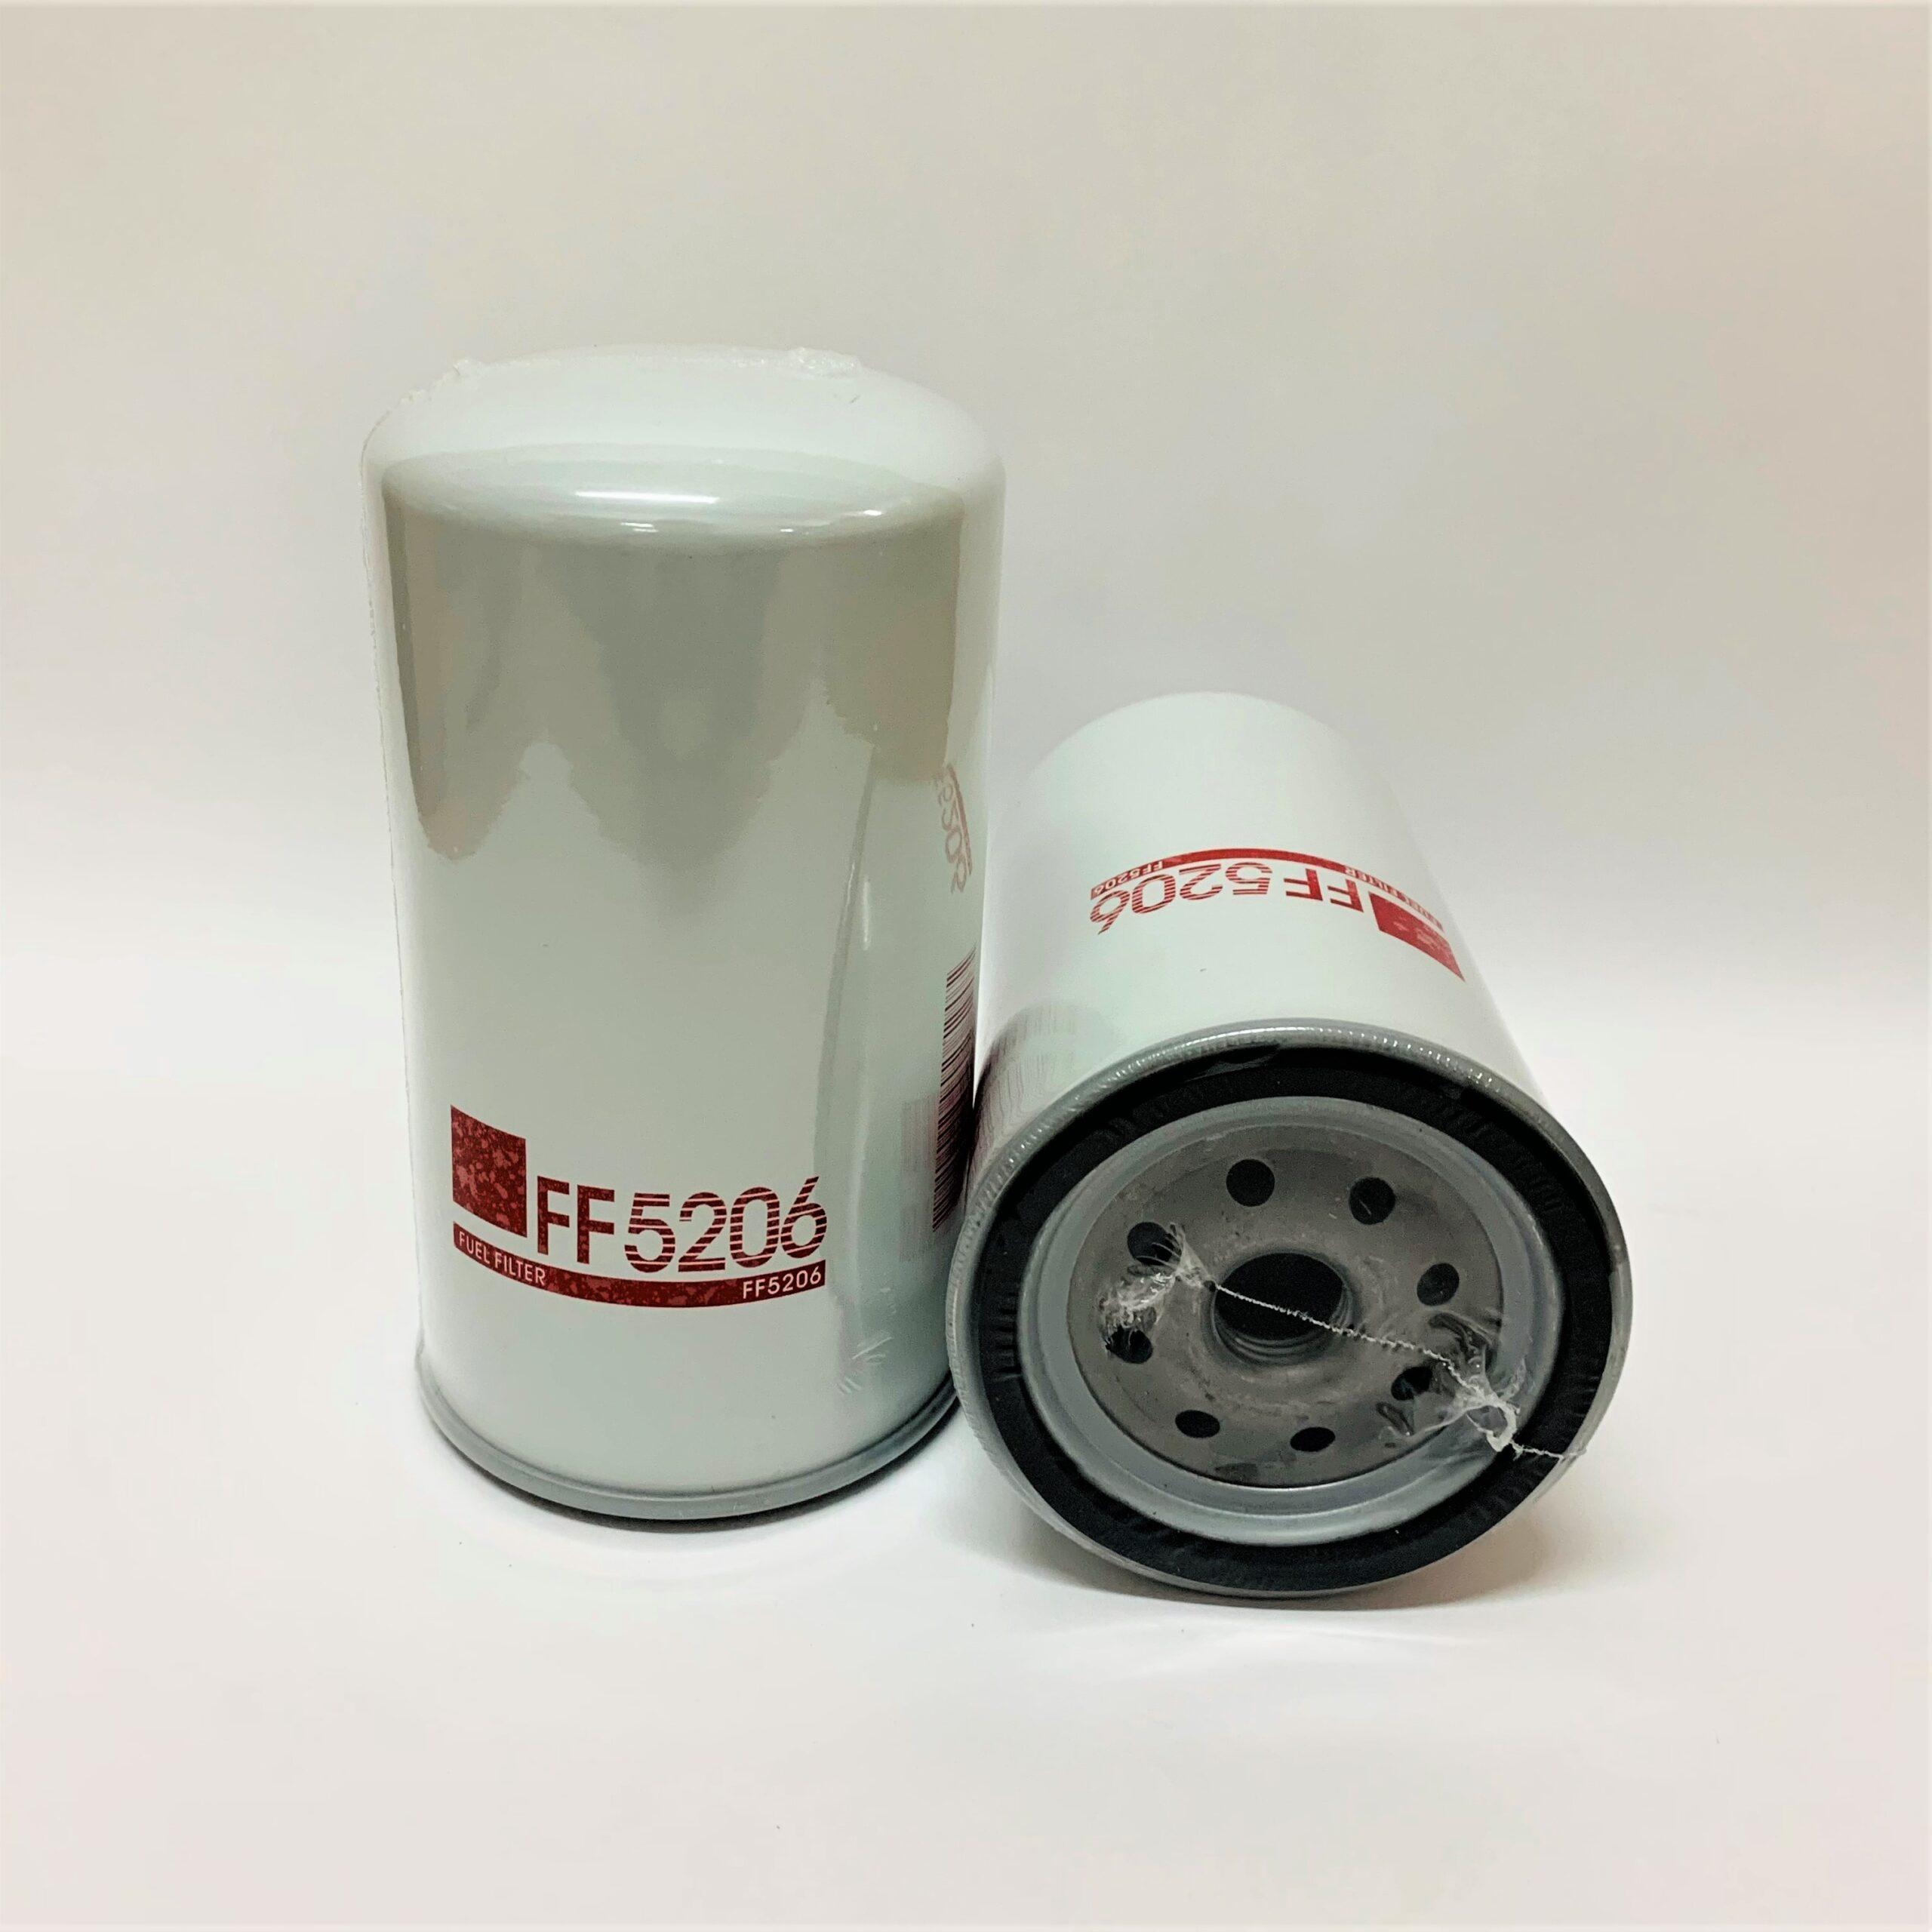 FF5206